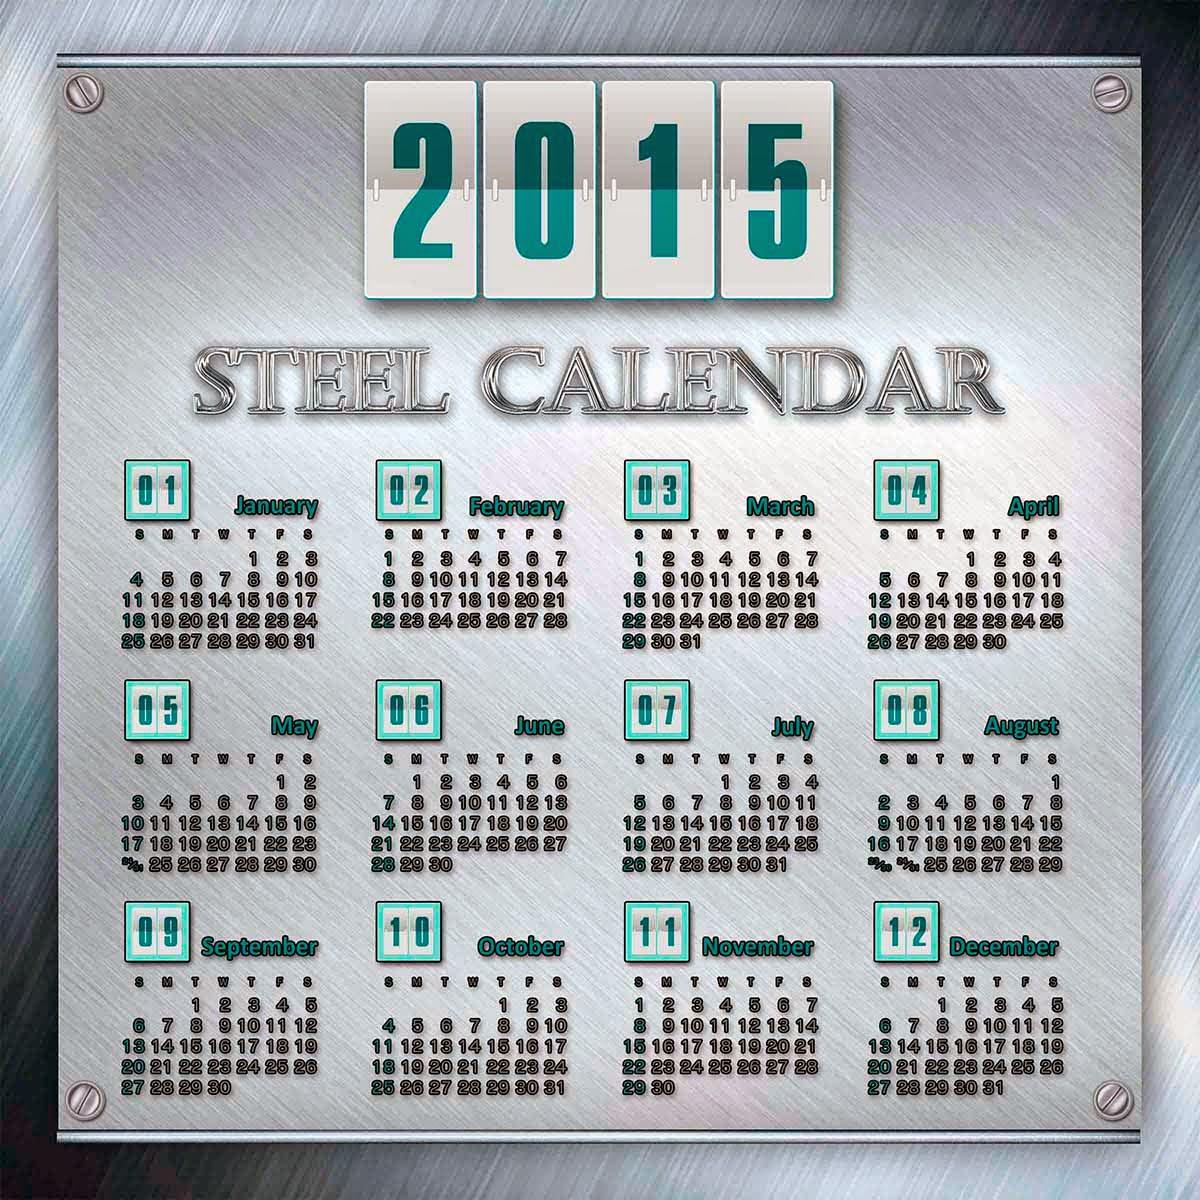 Placa metálica con un bonito calendario 2015 para Estados Unidos